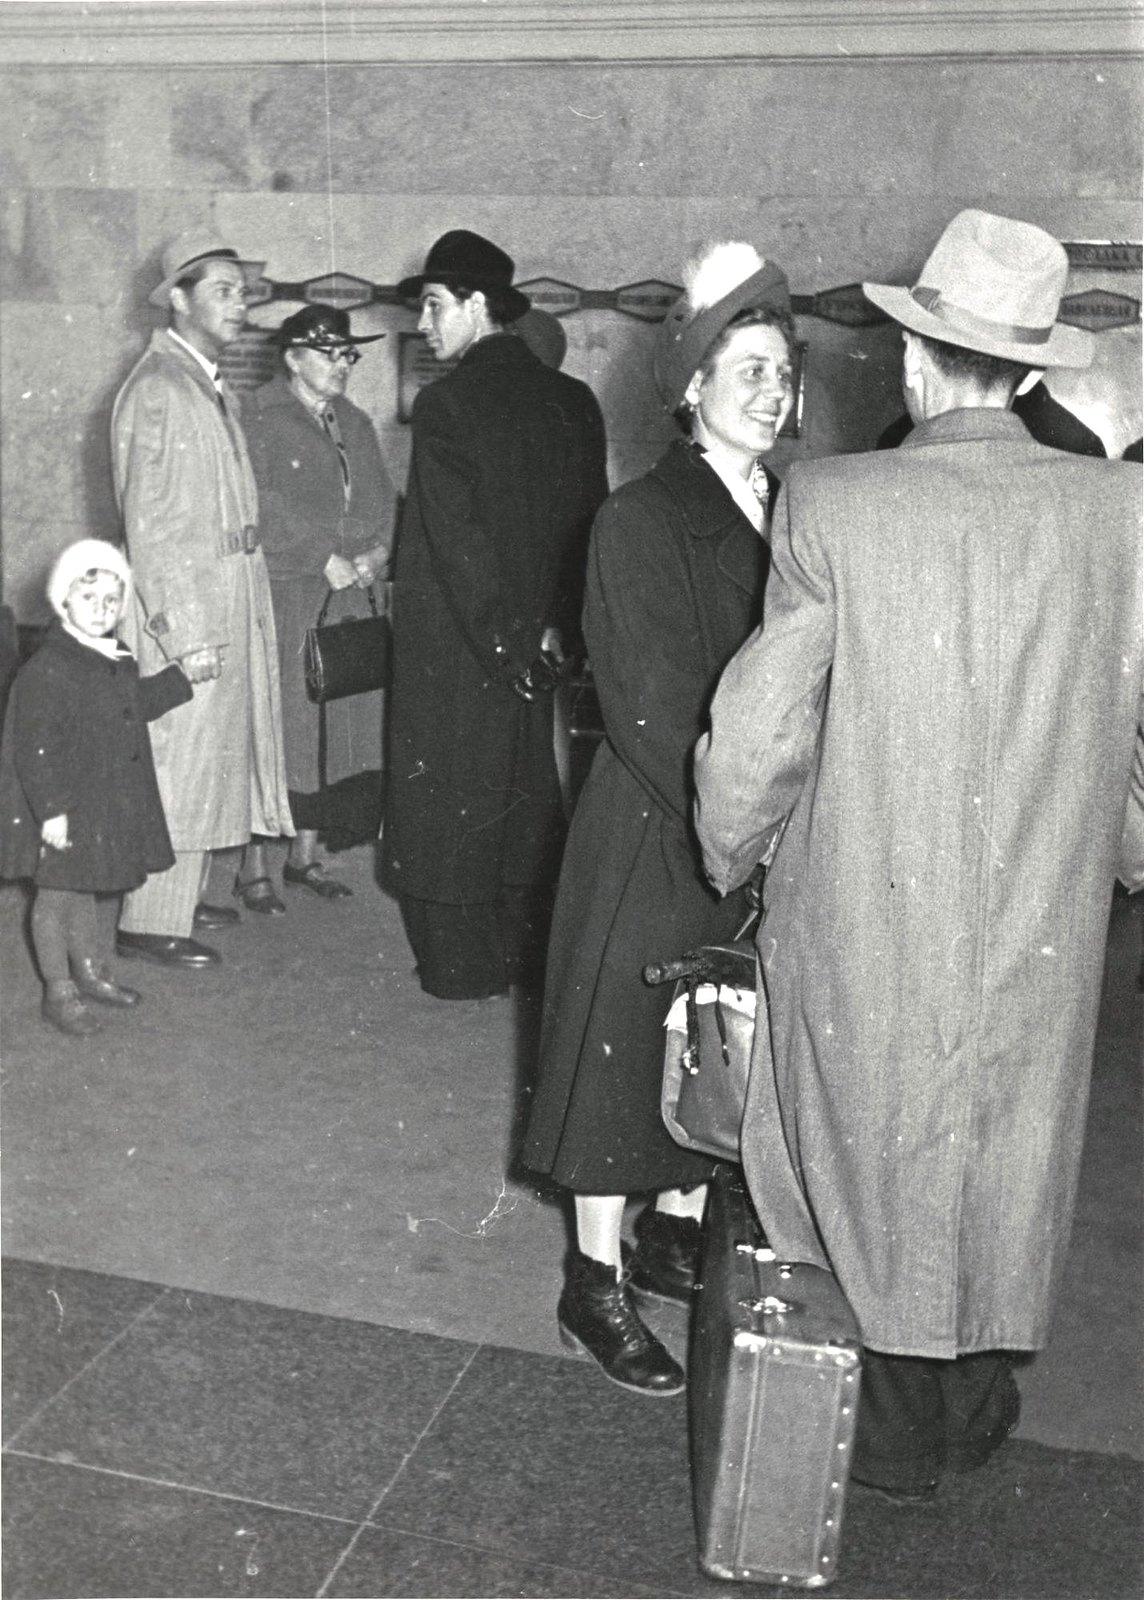 1949. В метро. Встреча